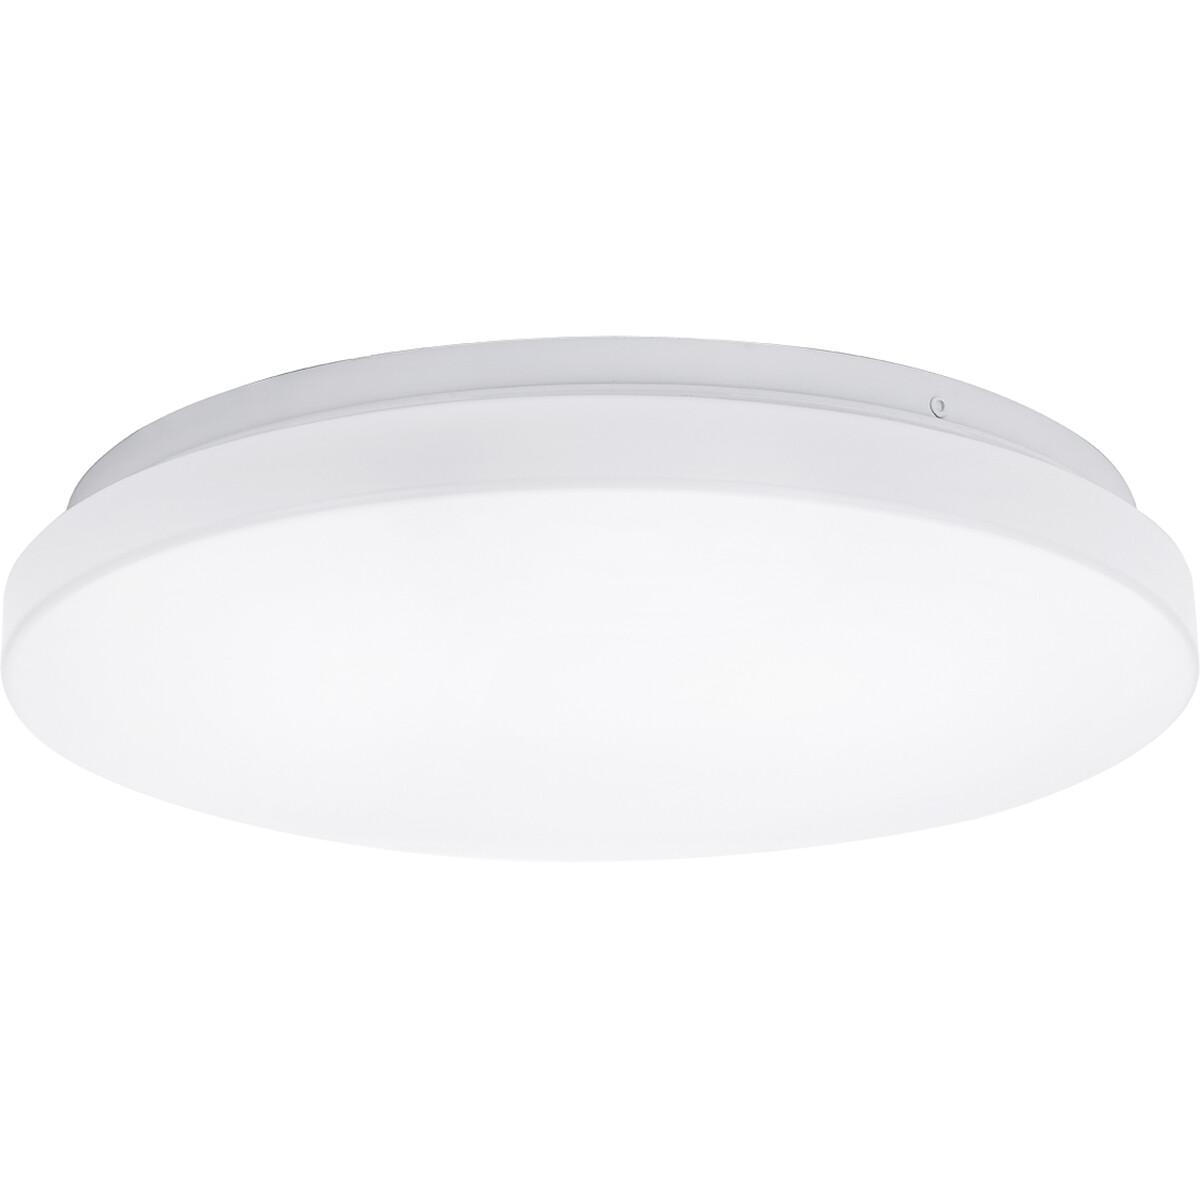 LED Plafondlamp - Aigi Alona - Opbouw Rond - 12W - Helder/Koud Wit 6500K - Mat Wit - Kunststof